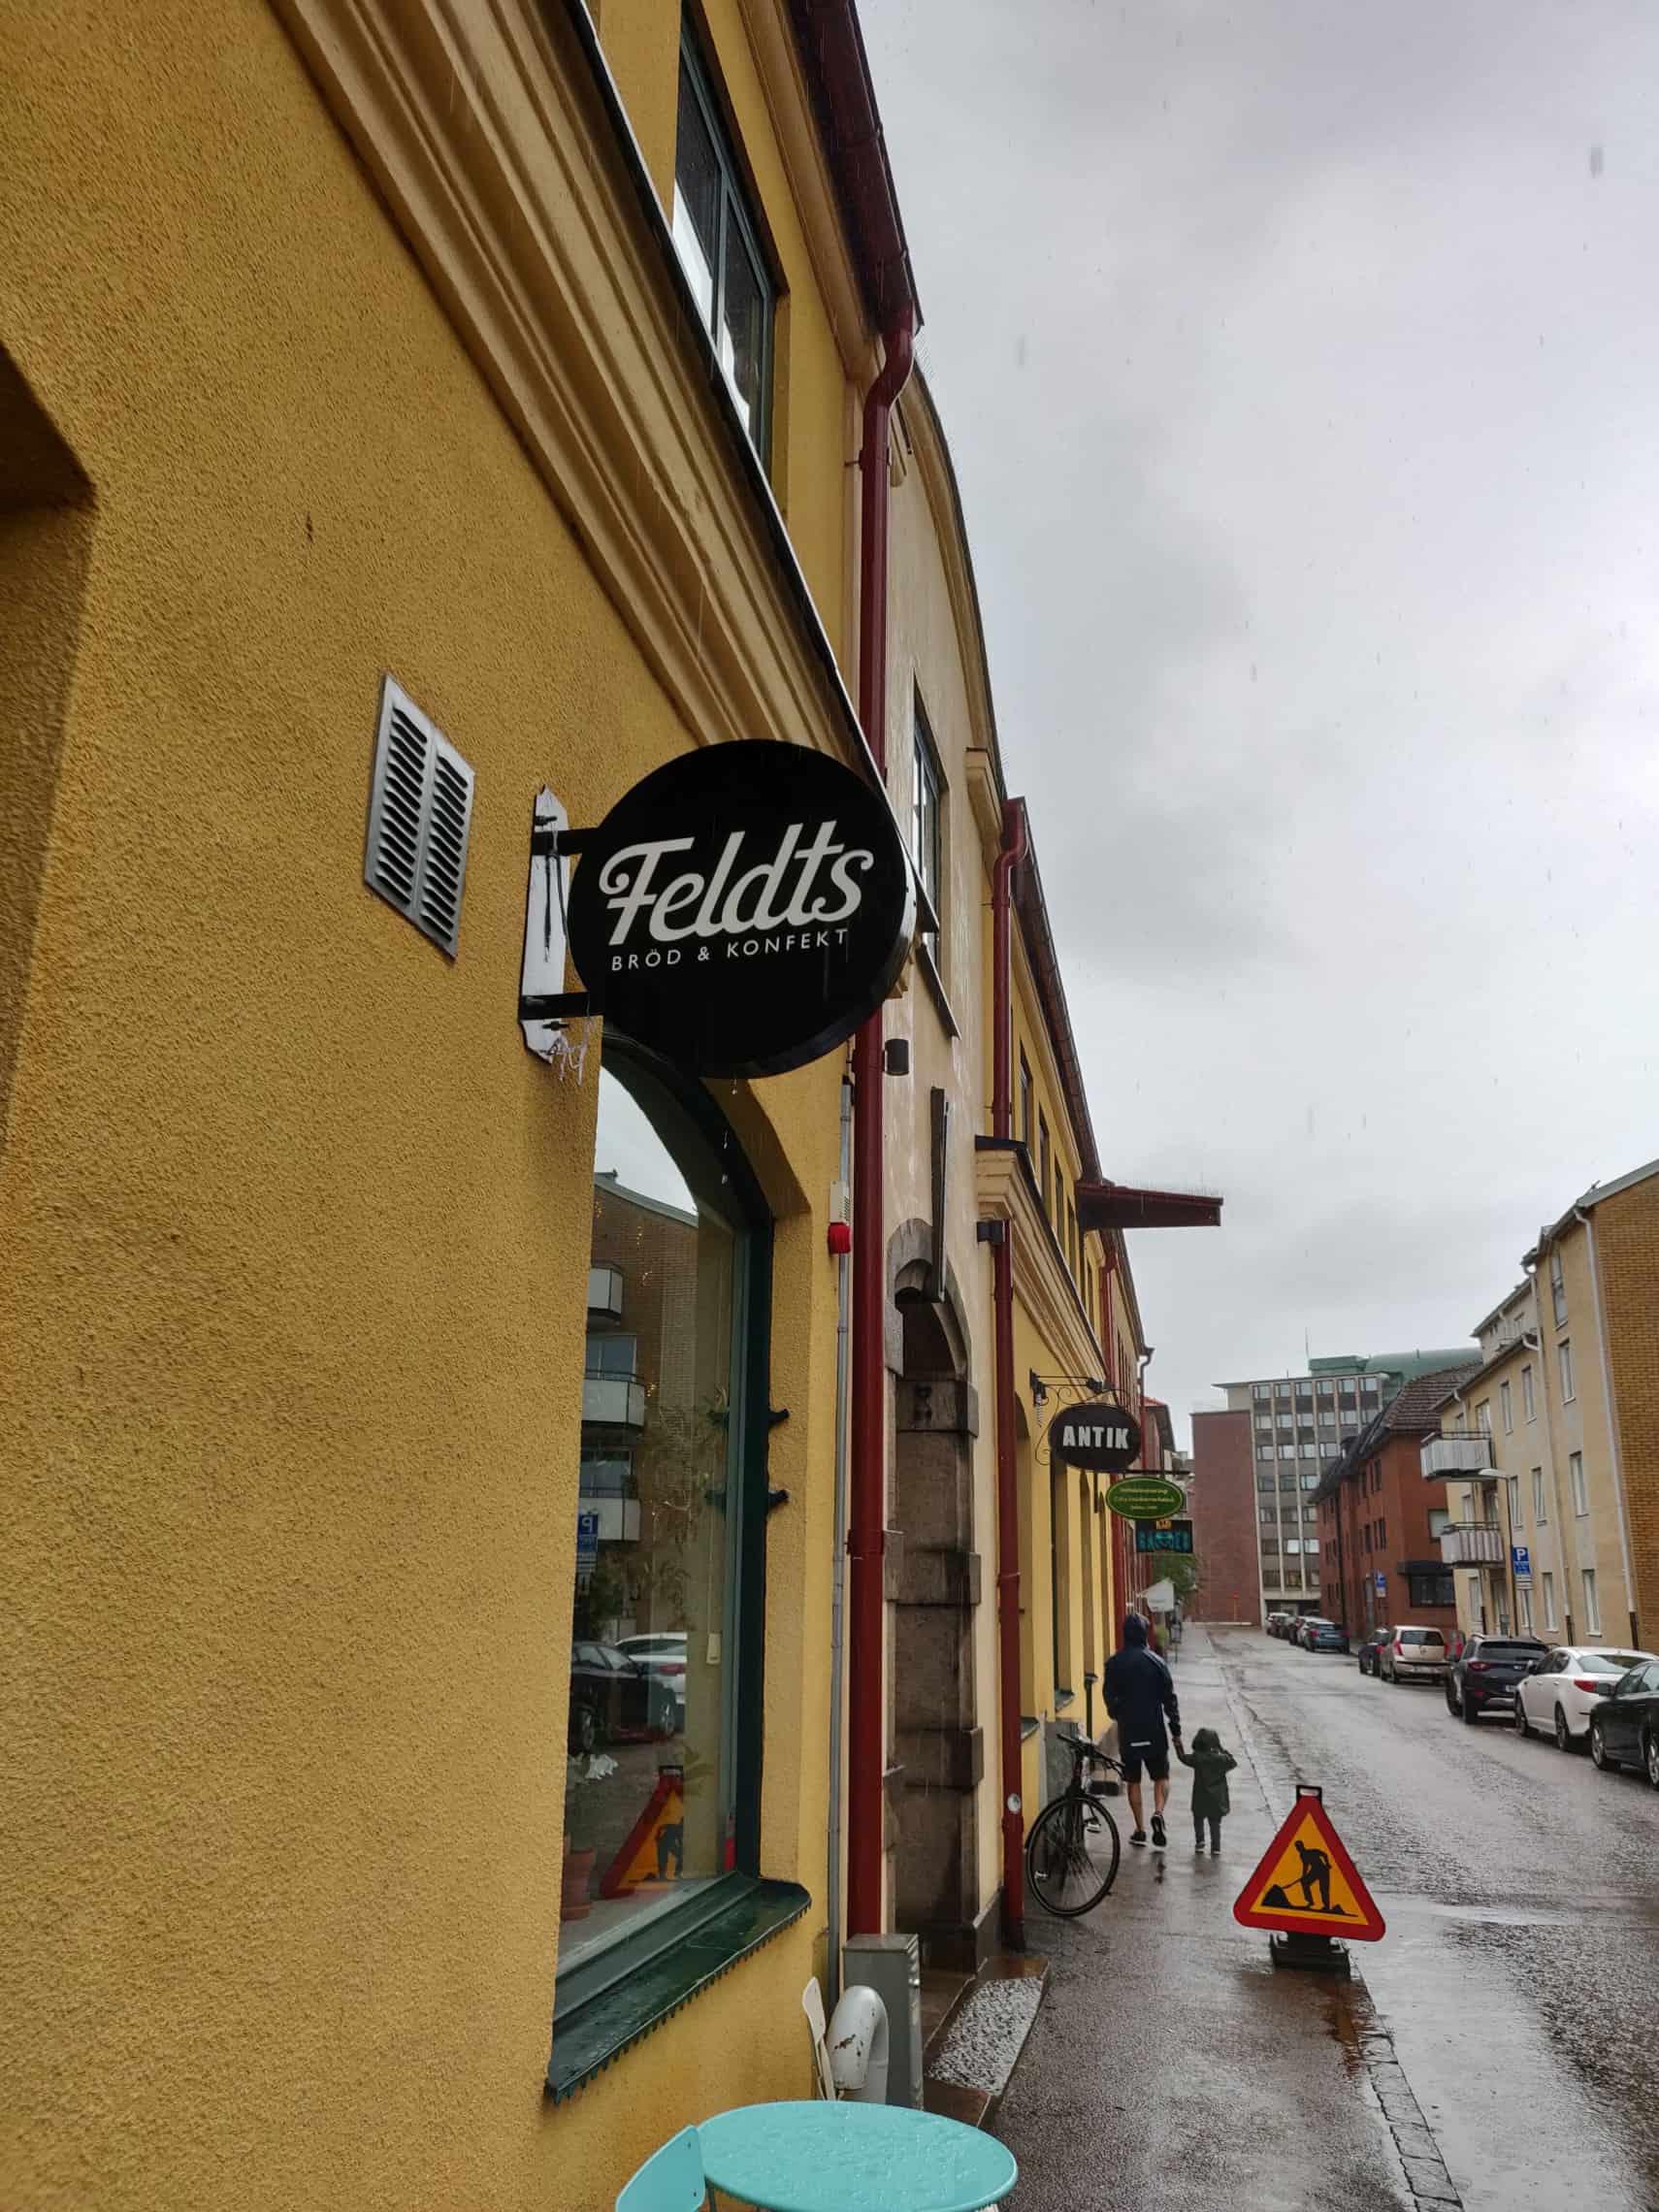 Matresa i södra Sverige 1